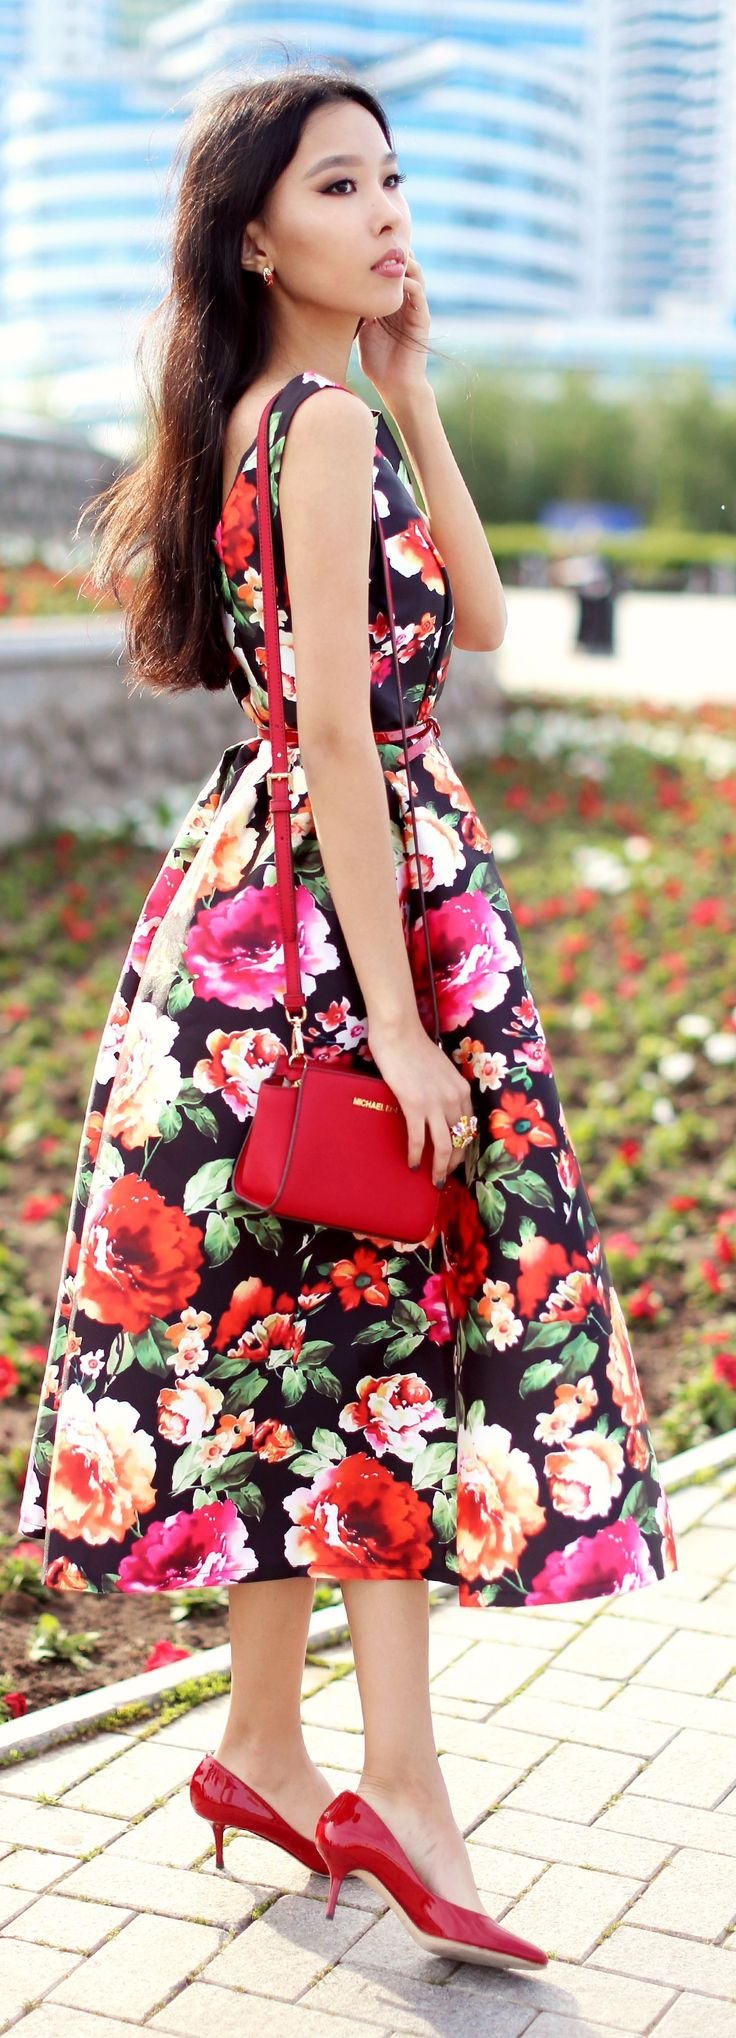 JW ASSEMBLY | #jw #jwfashion #jw_modest_fashion | Floral Dress Summer Style